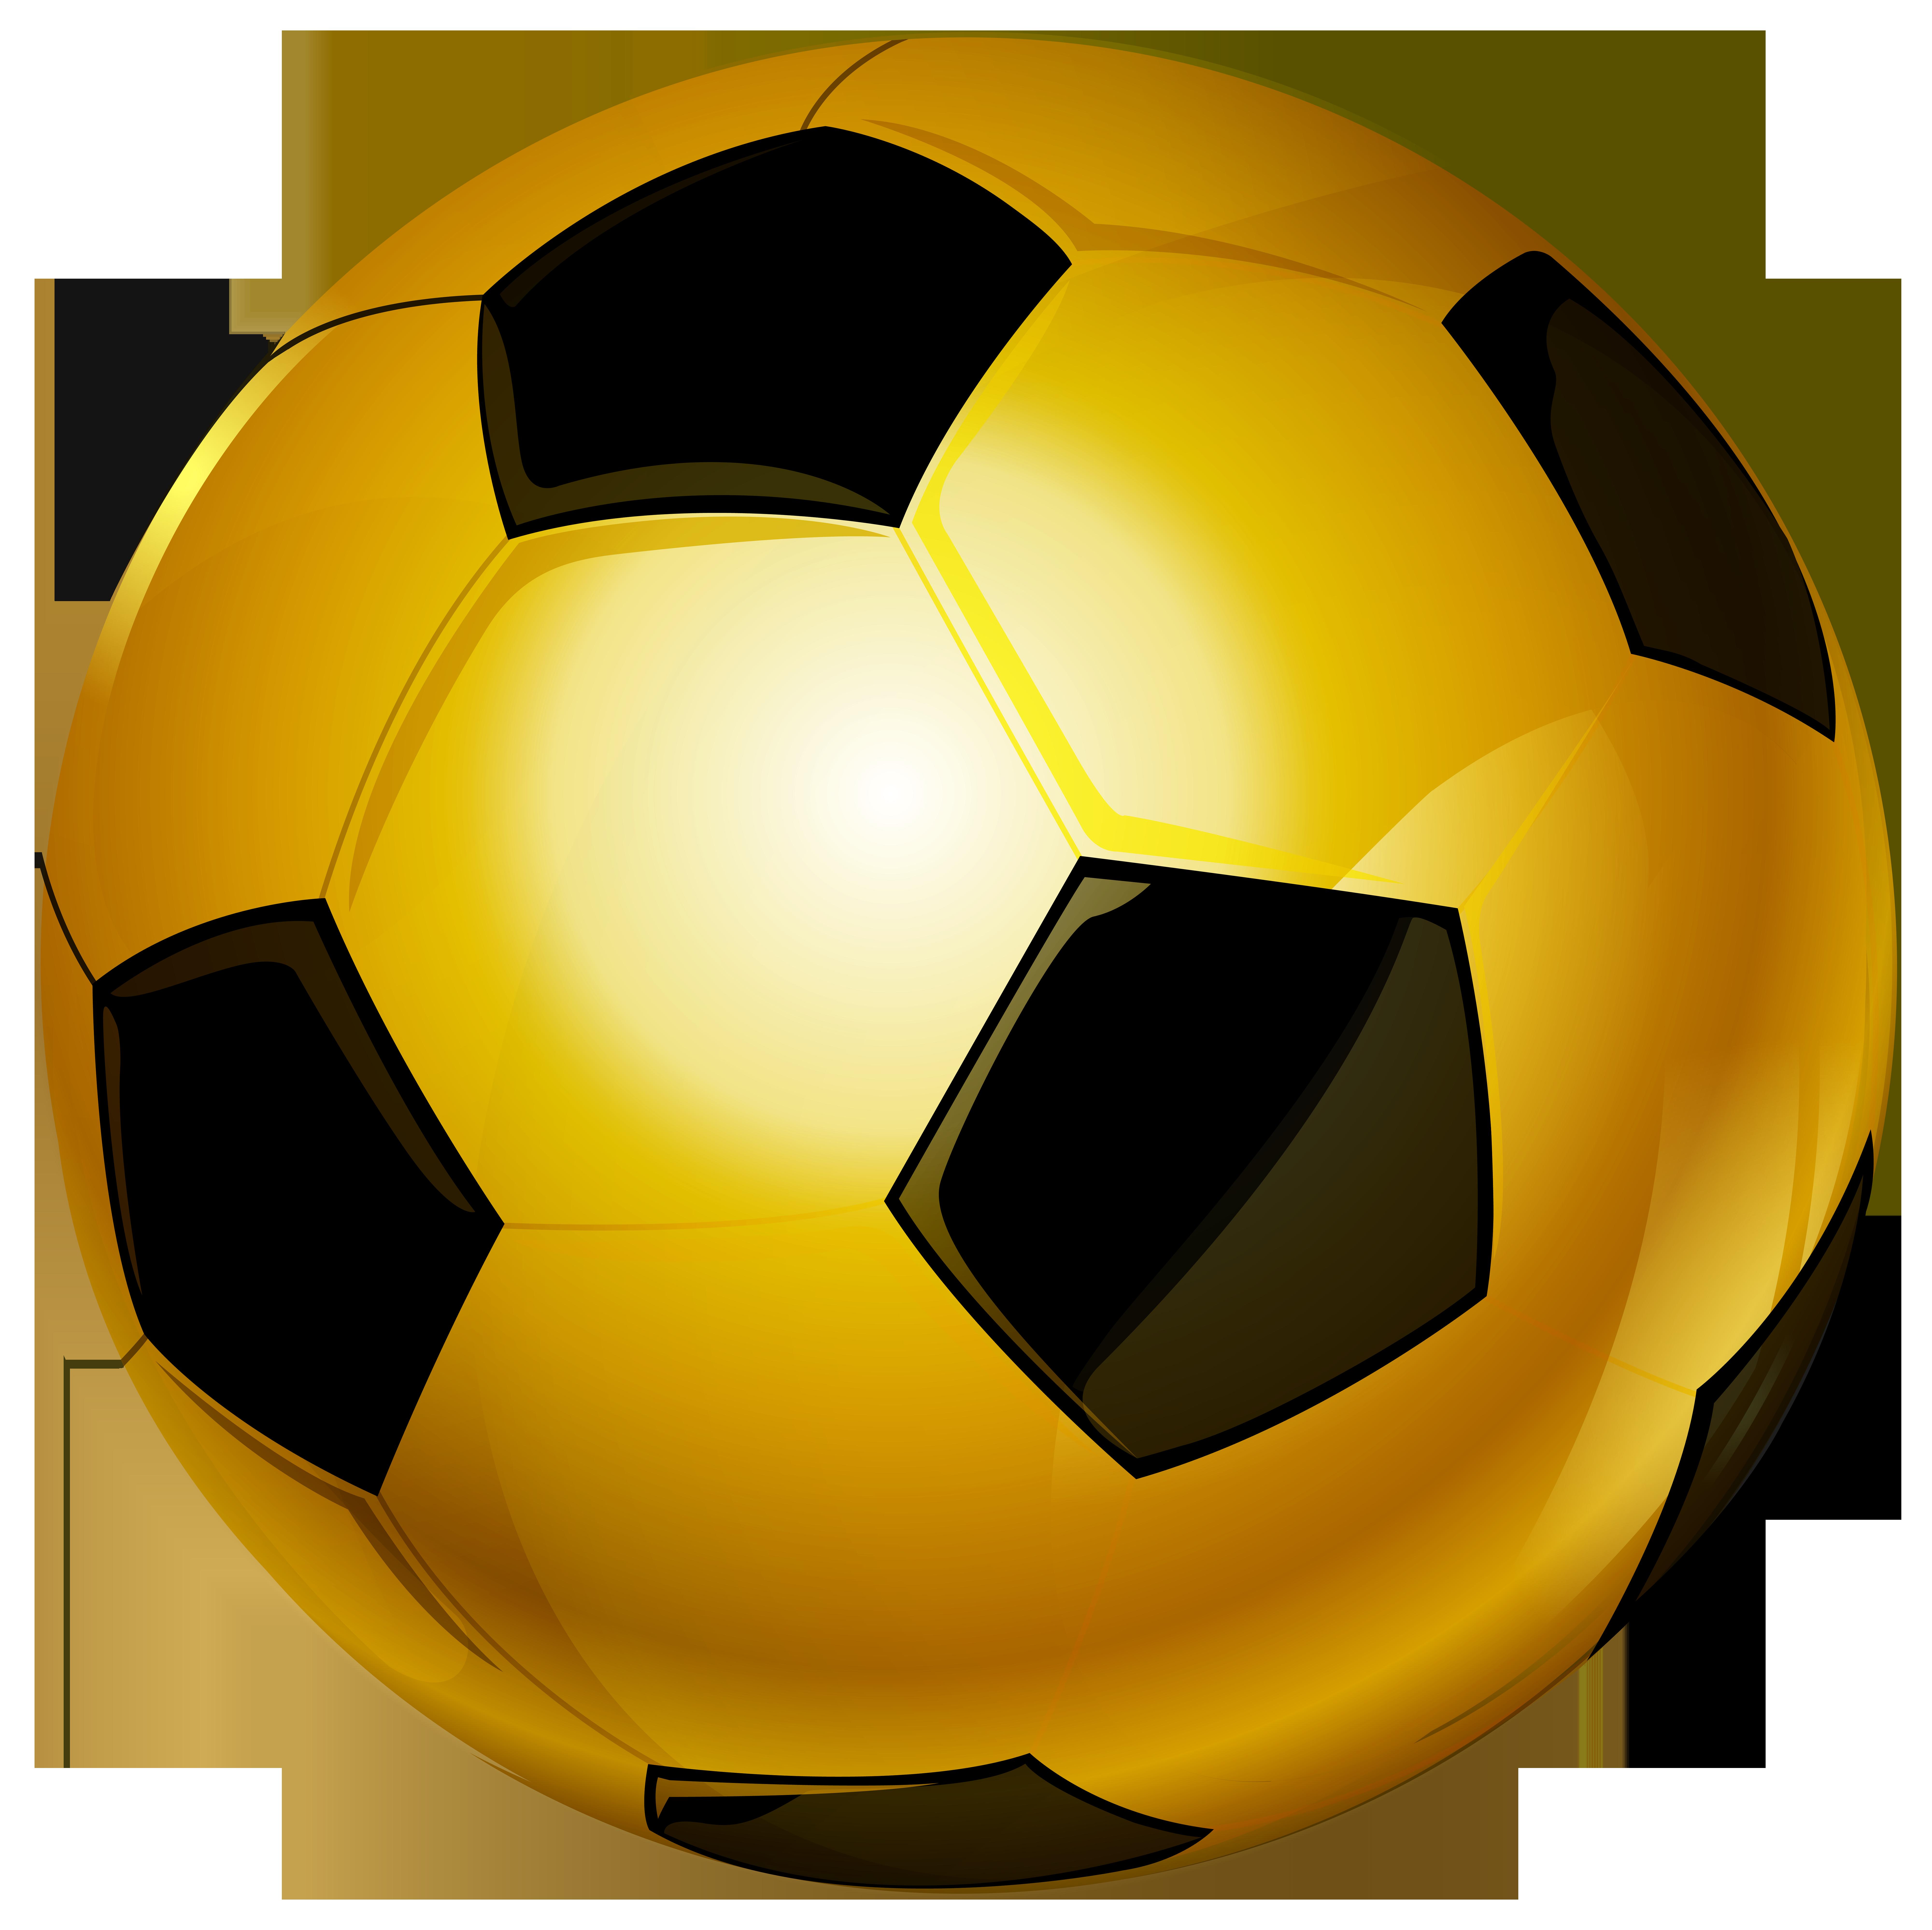 vector transparent download Ball transparent gold. Soccer png clip art